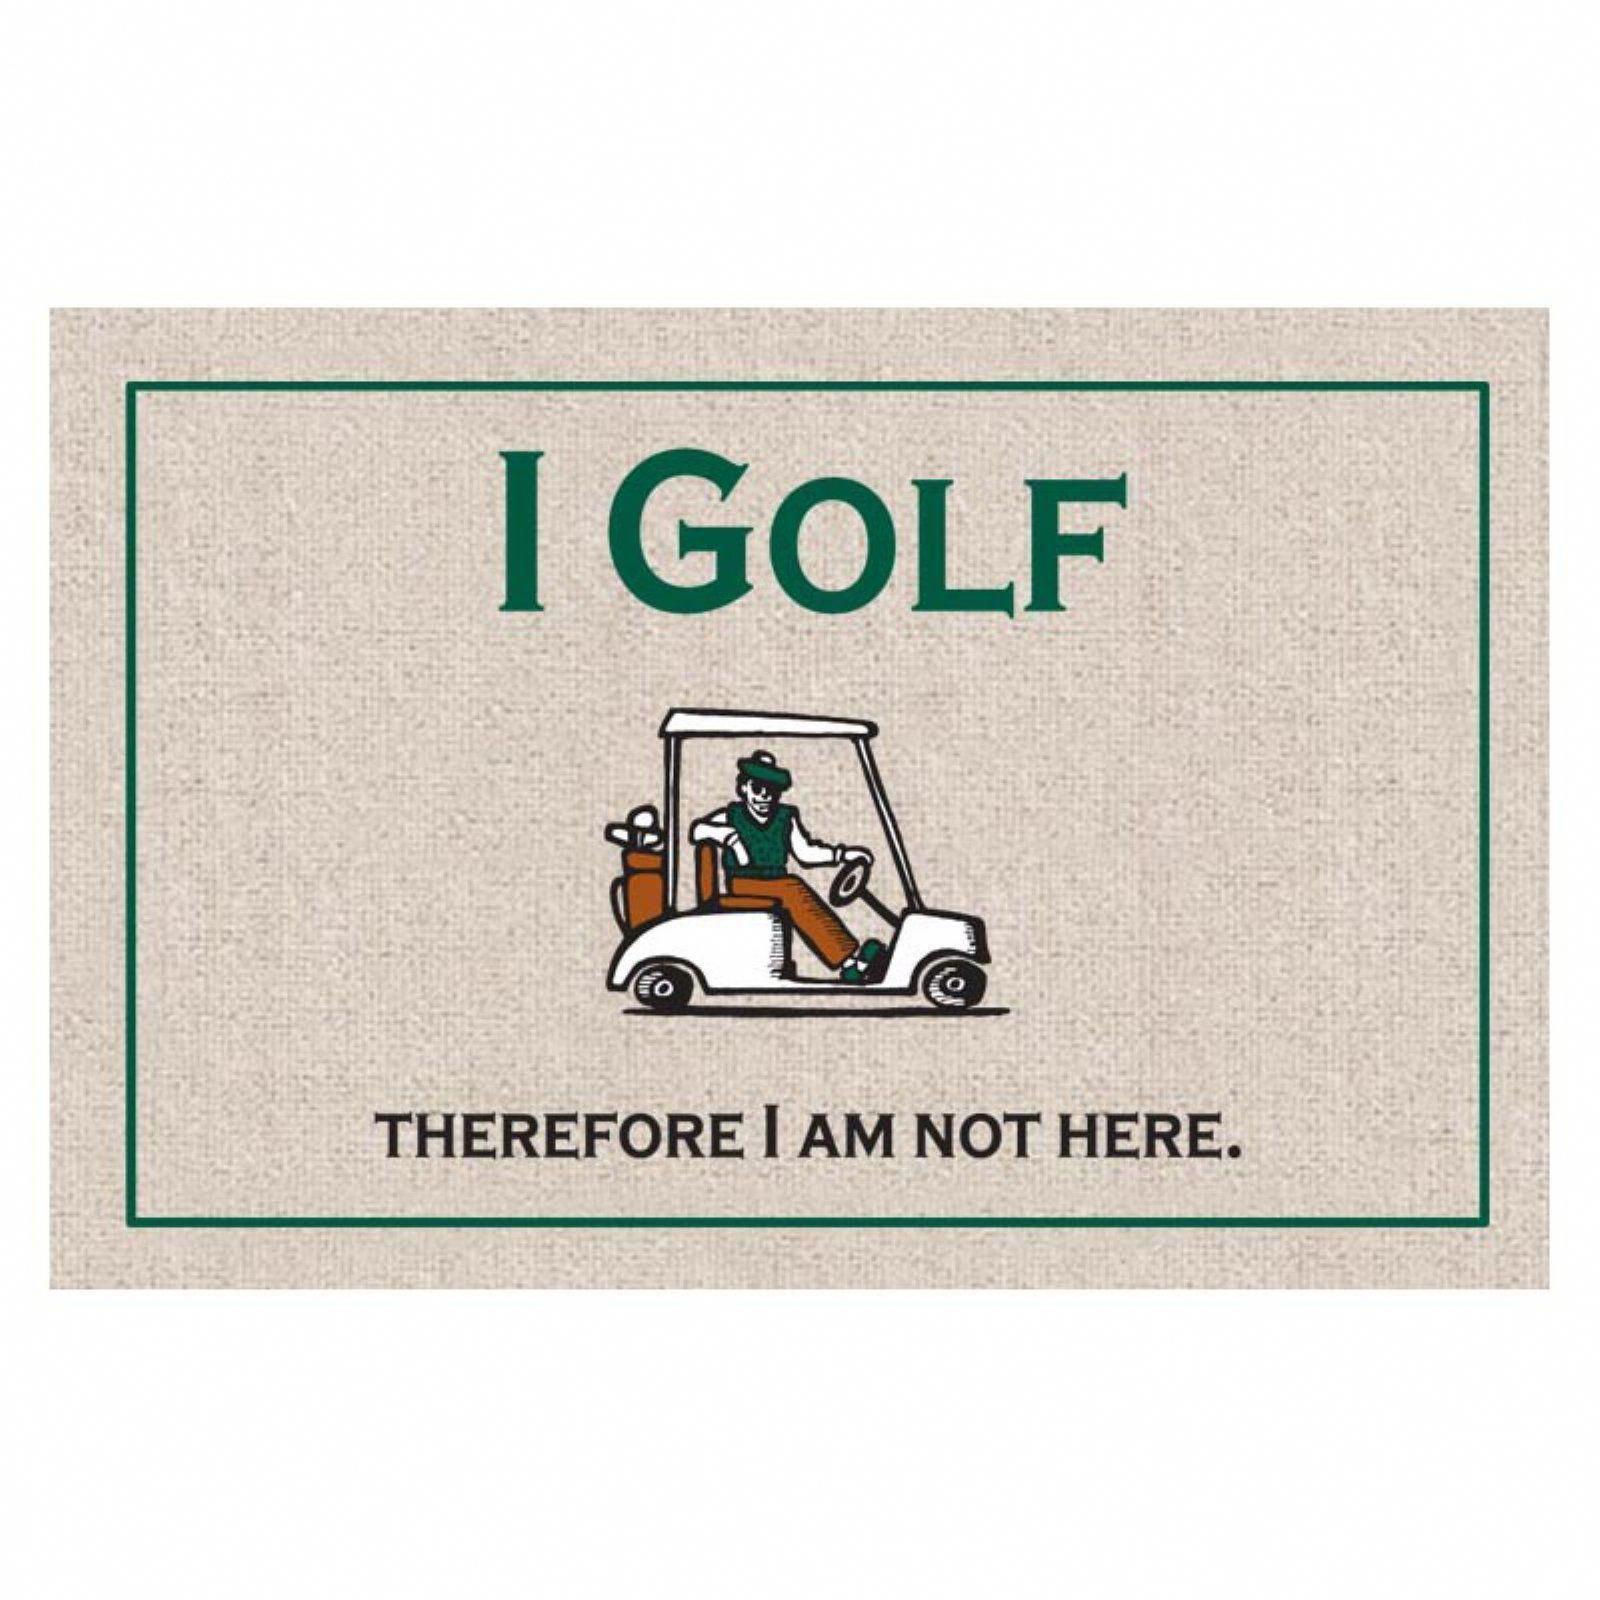 golf humor cartoons #Golfhumor #golfhumor